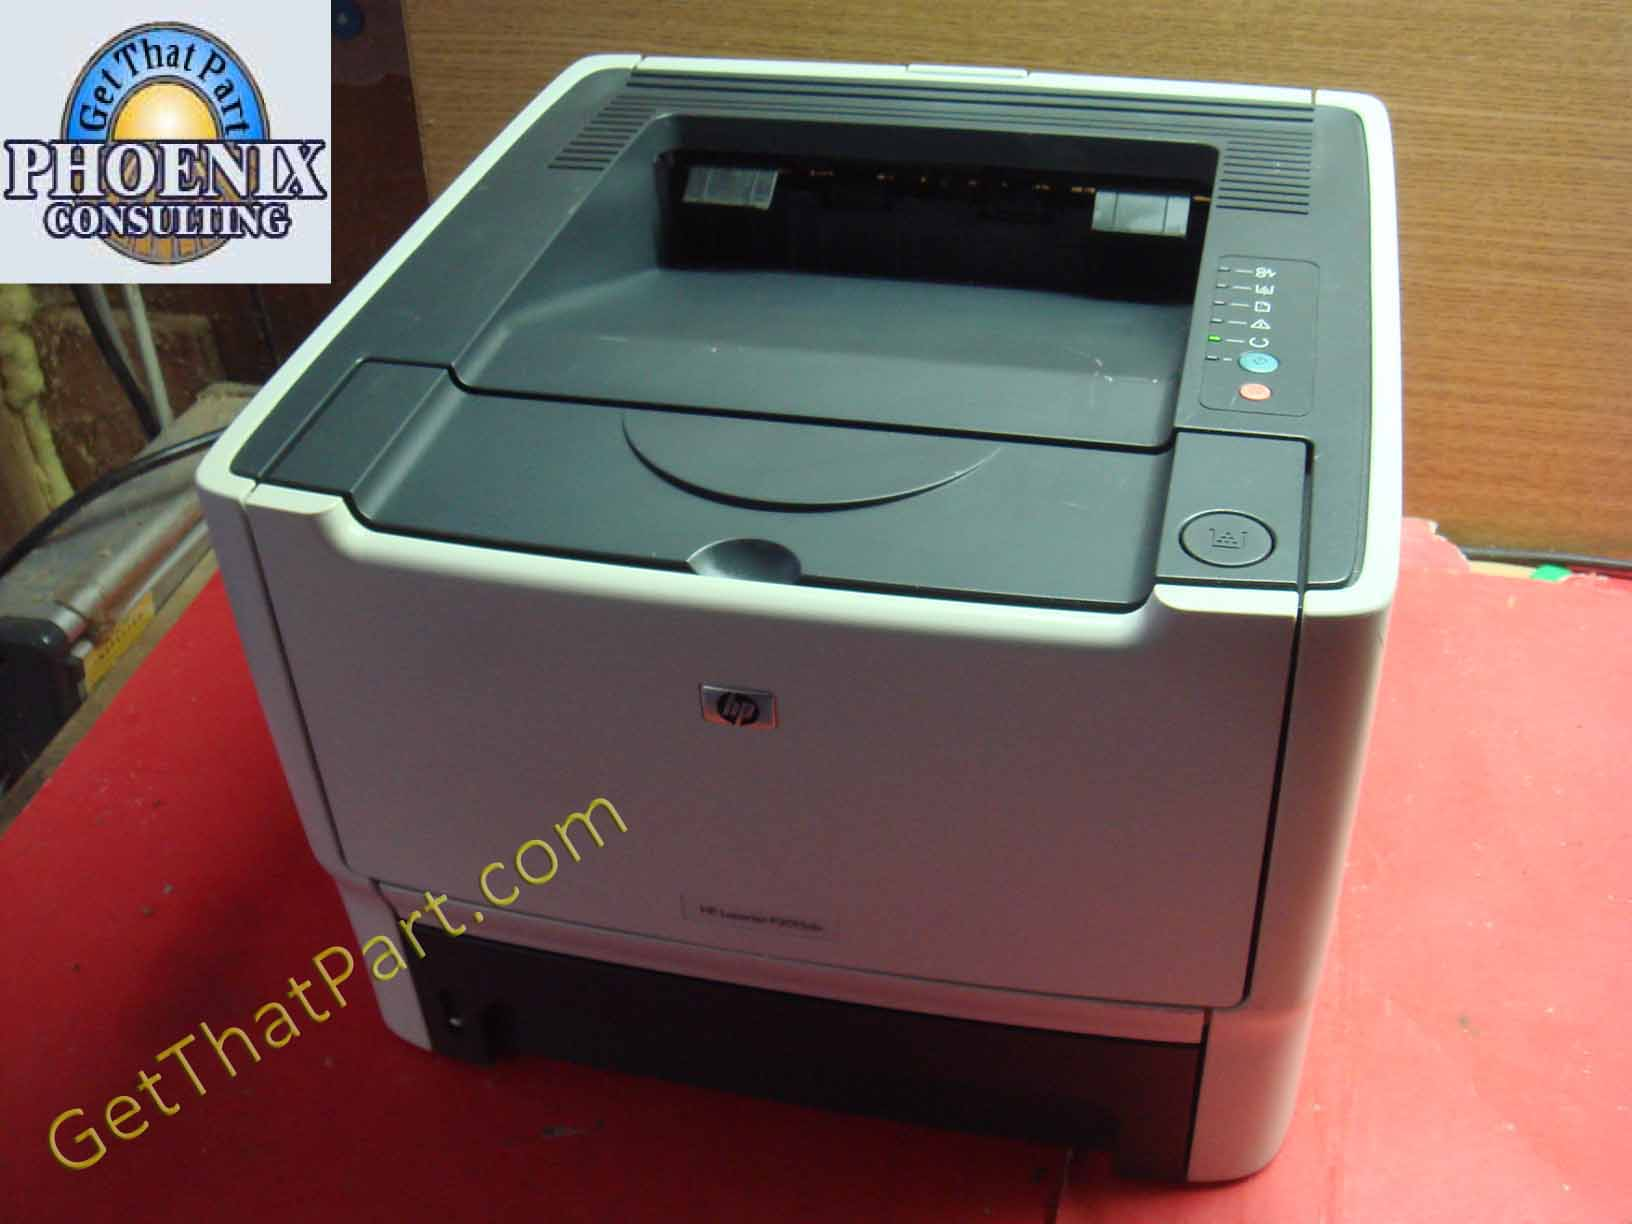 hp laserjet p2015 p2015dn desktop duplex network printer cb368a. Black Bedroom Furniture Sets. Home Design Ideas